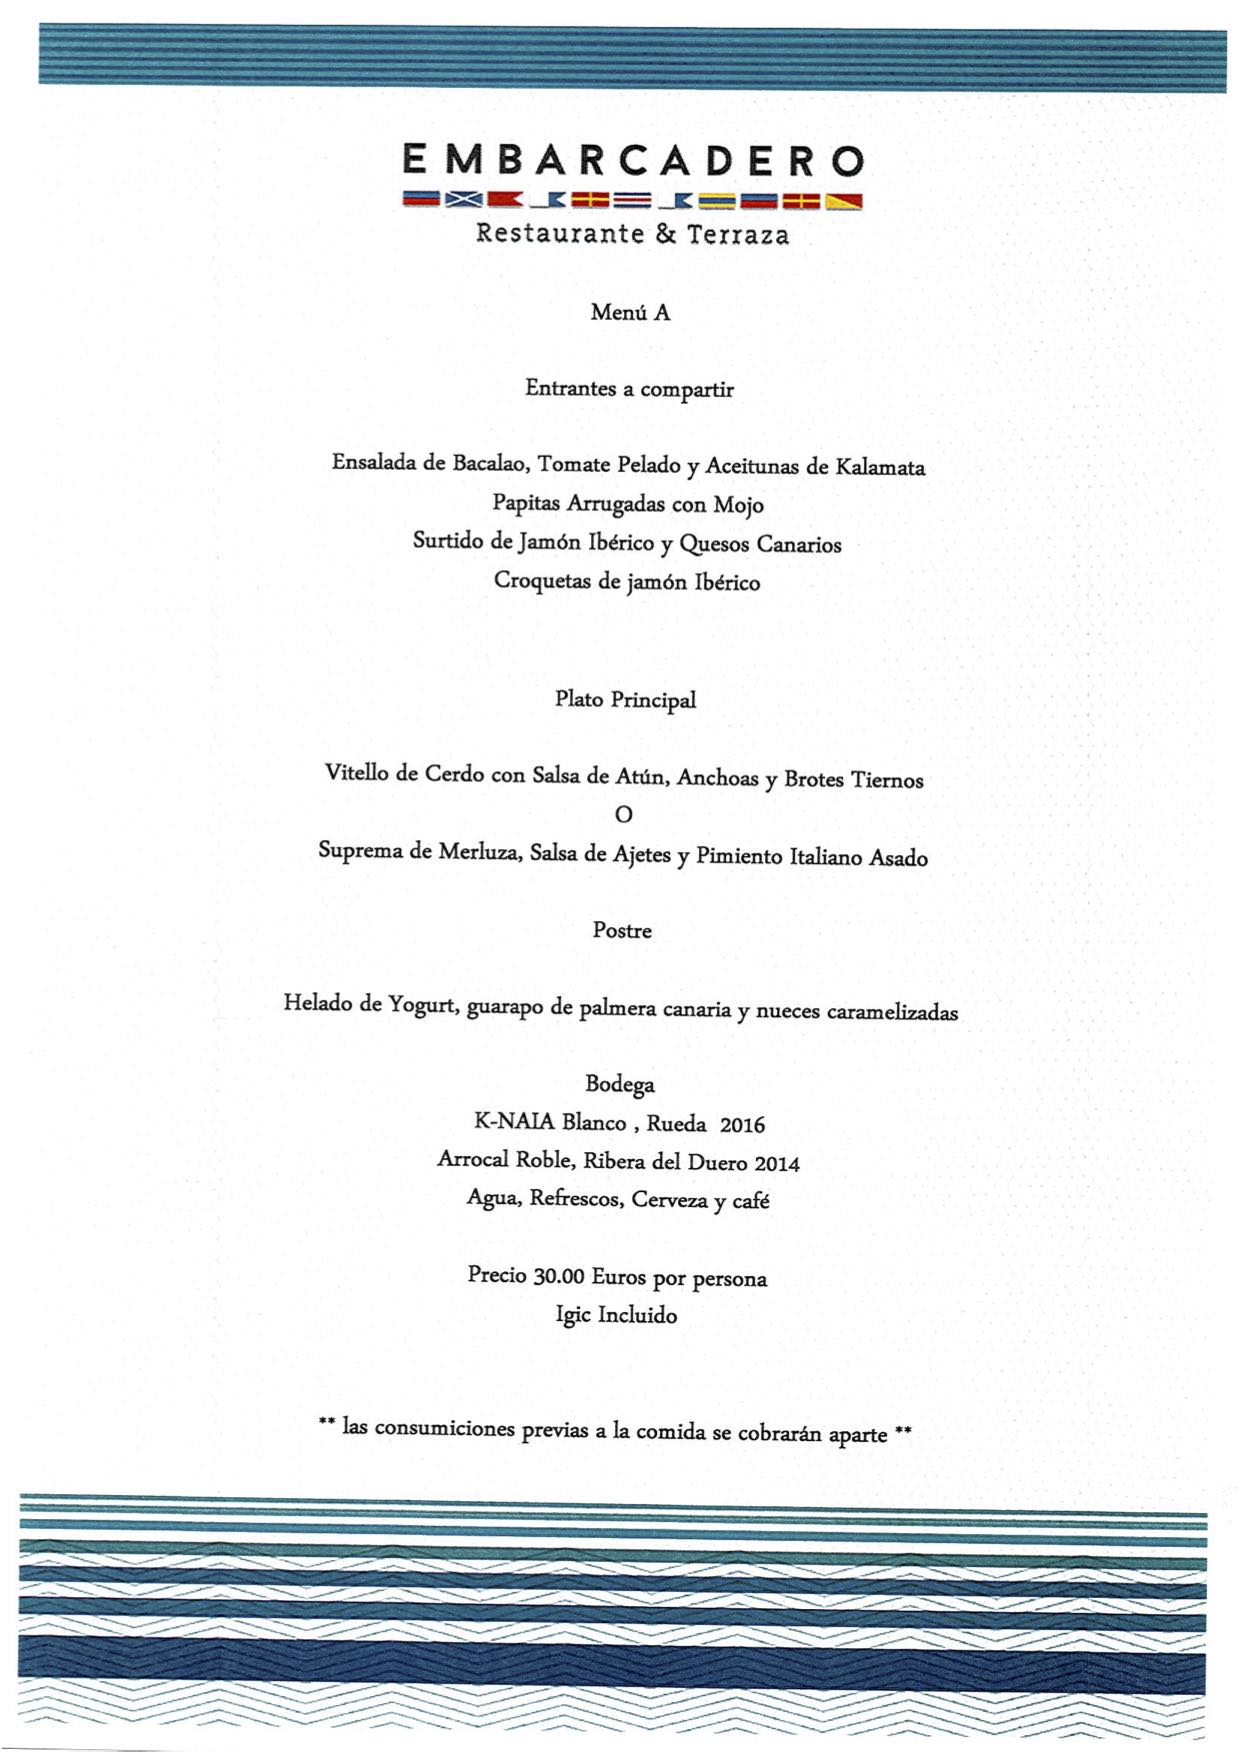 embarcadero-eventos-menu-a